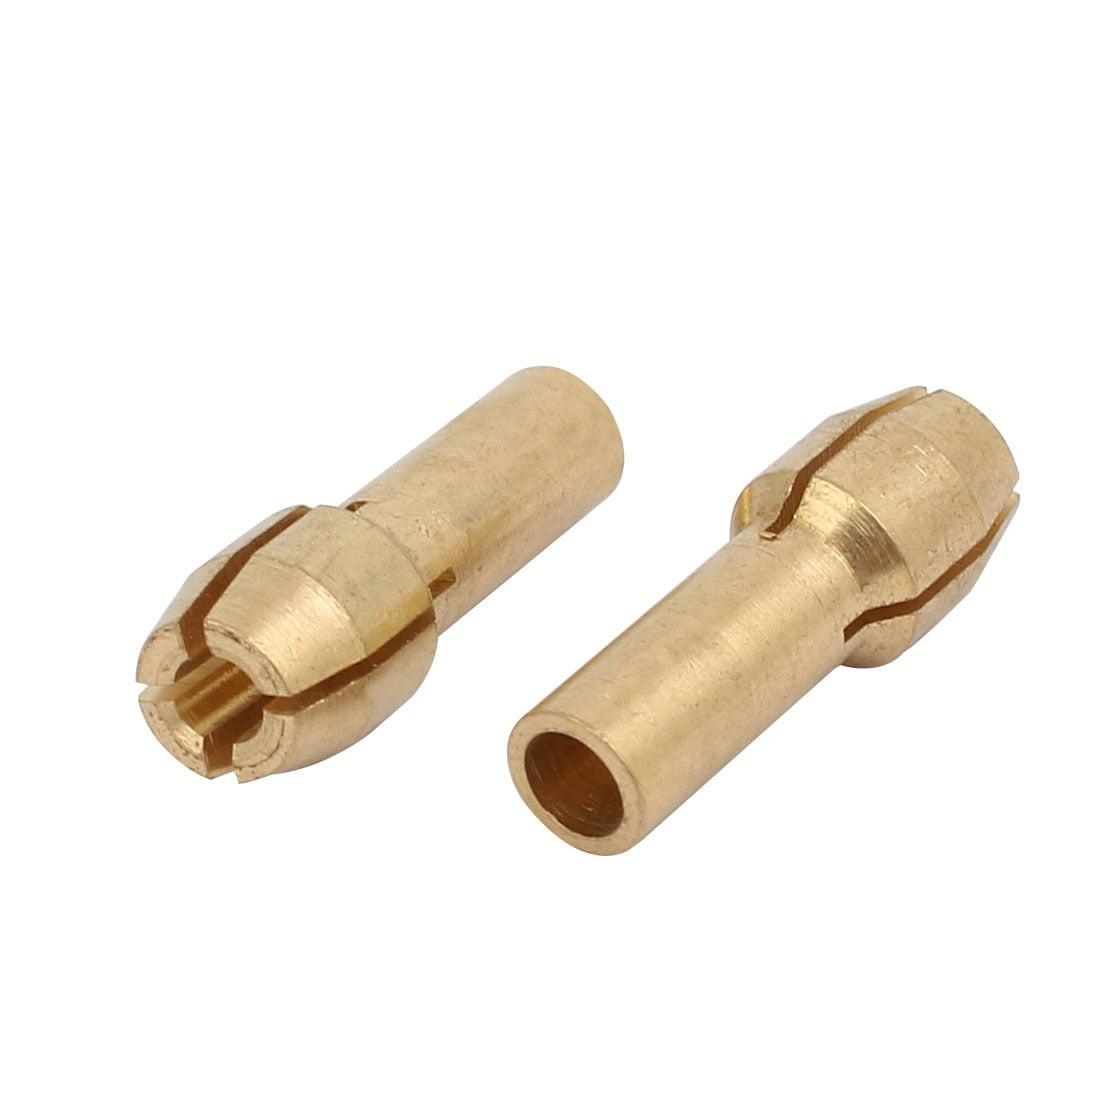 Unique Bargains 15pcs 2.4mm Clamping Dia Brass Qucik Change Collet Nut for Rotary Power Tool - image 2 de 3